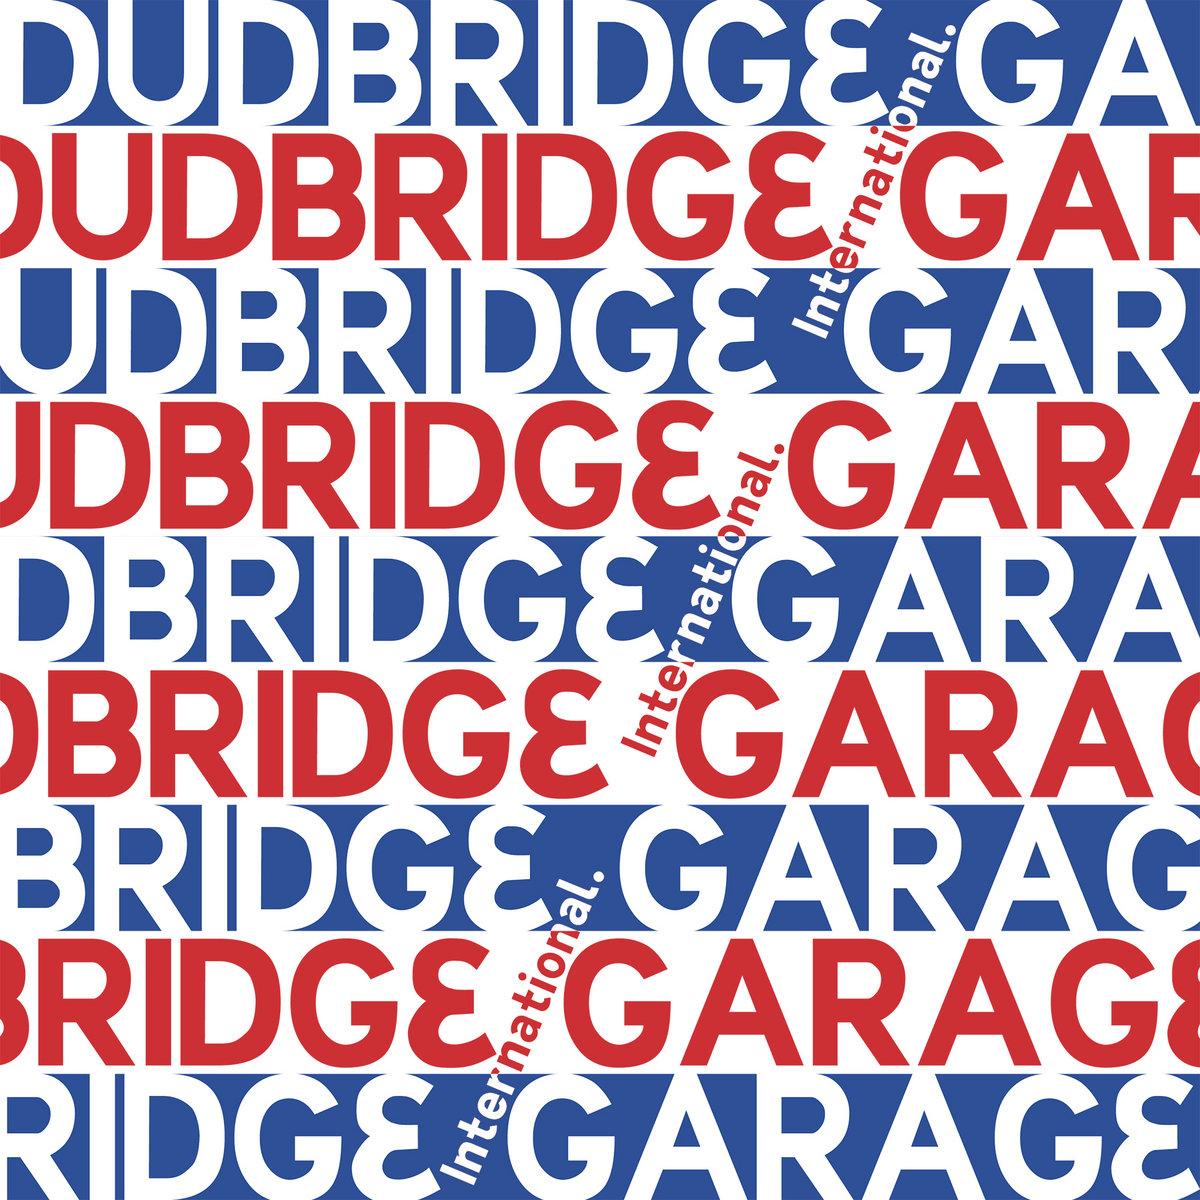 PREMIERE: Chungo - Shuv It [DubBridge Garage International]